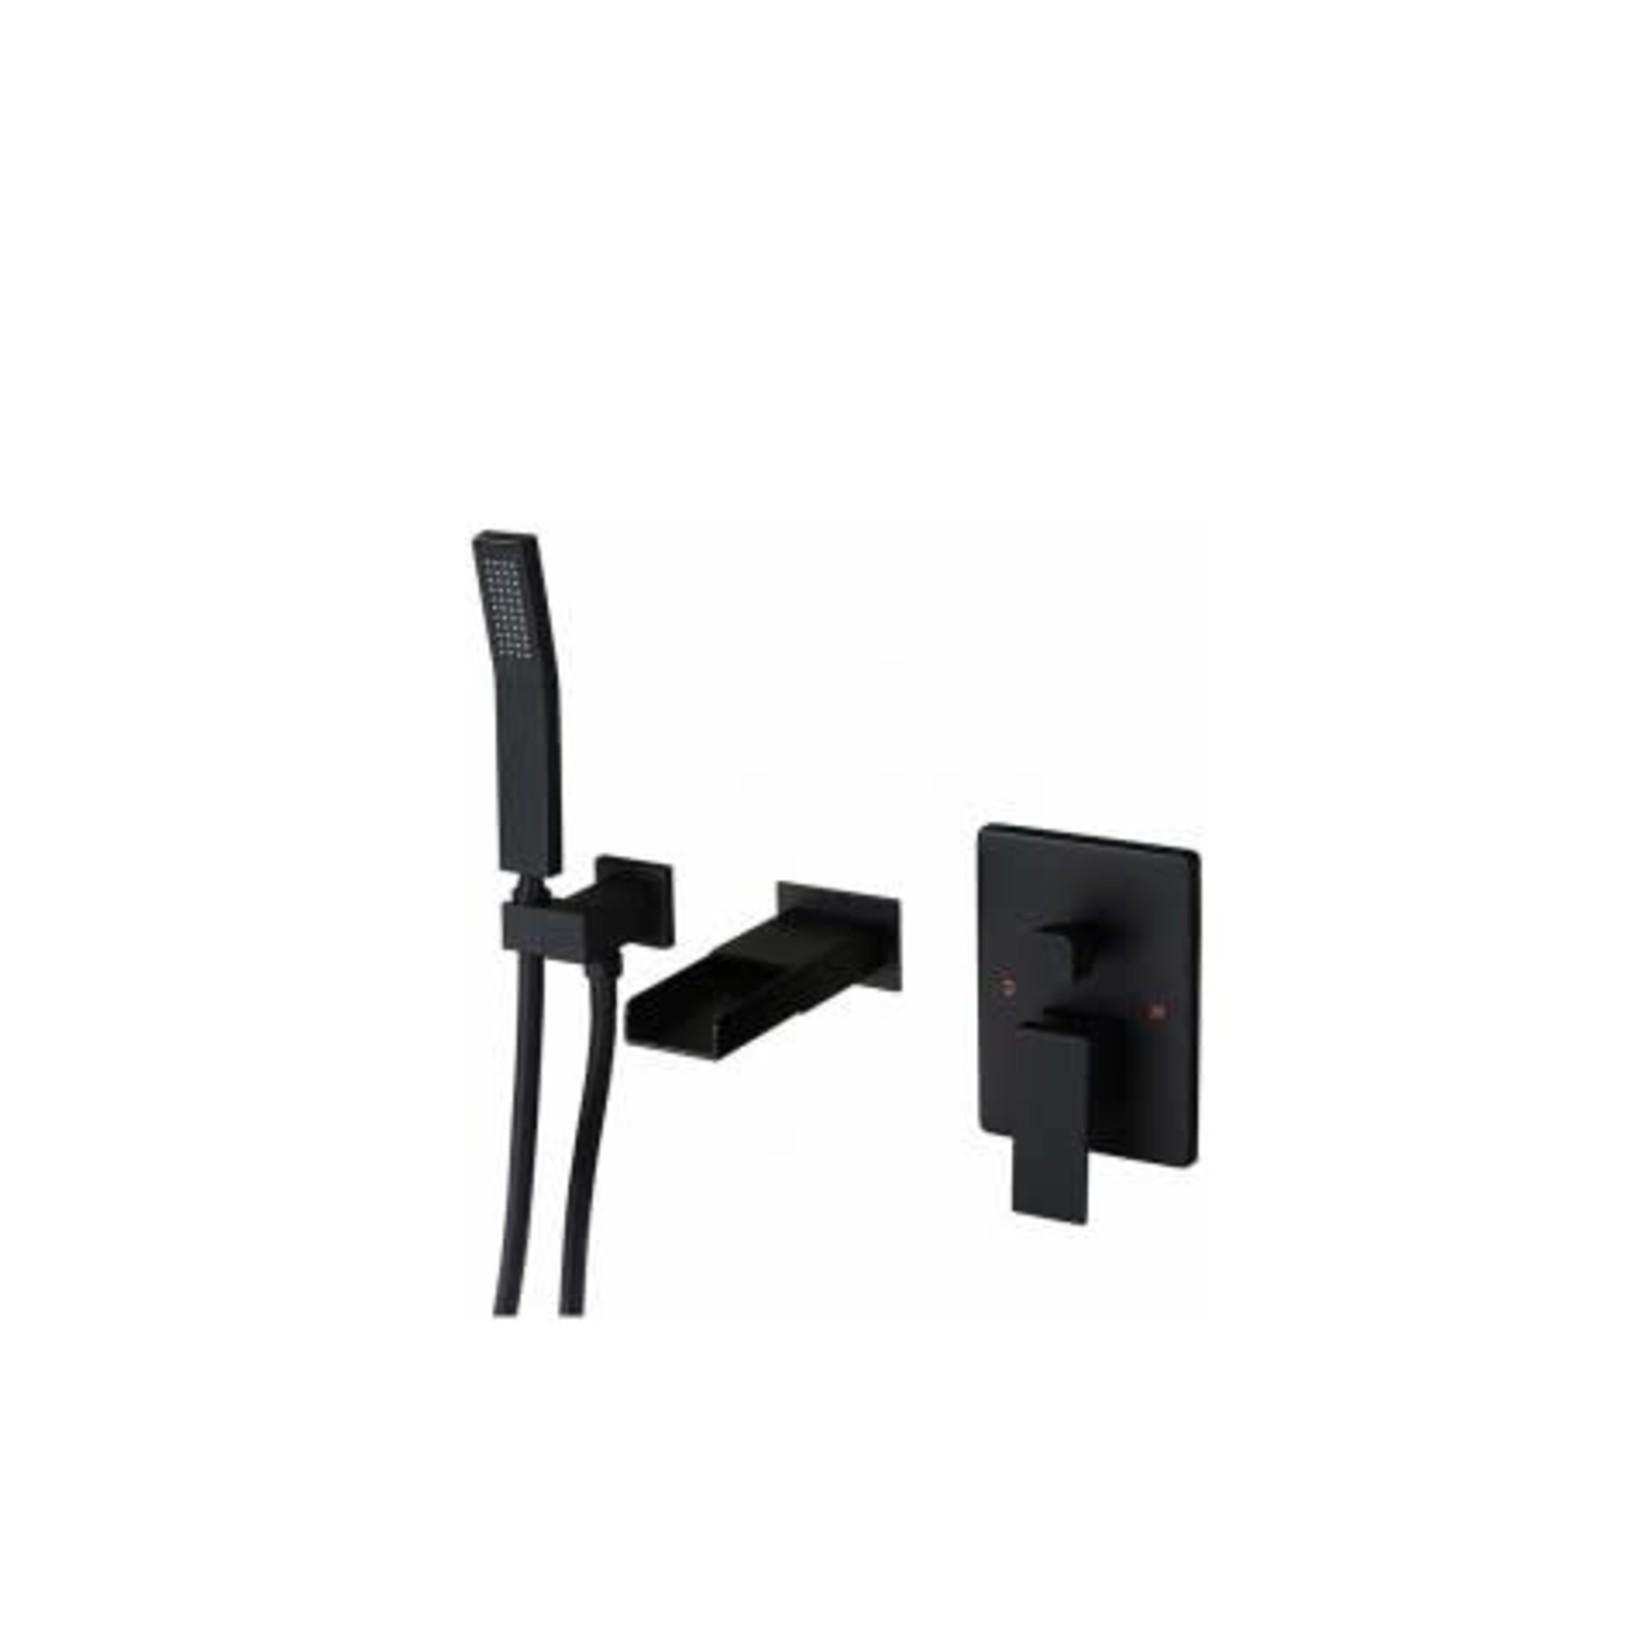 Wall-mounted tub faucet 141-11 matte black finish